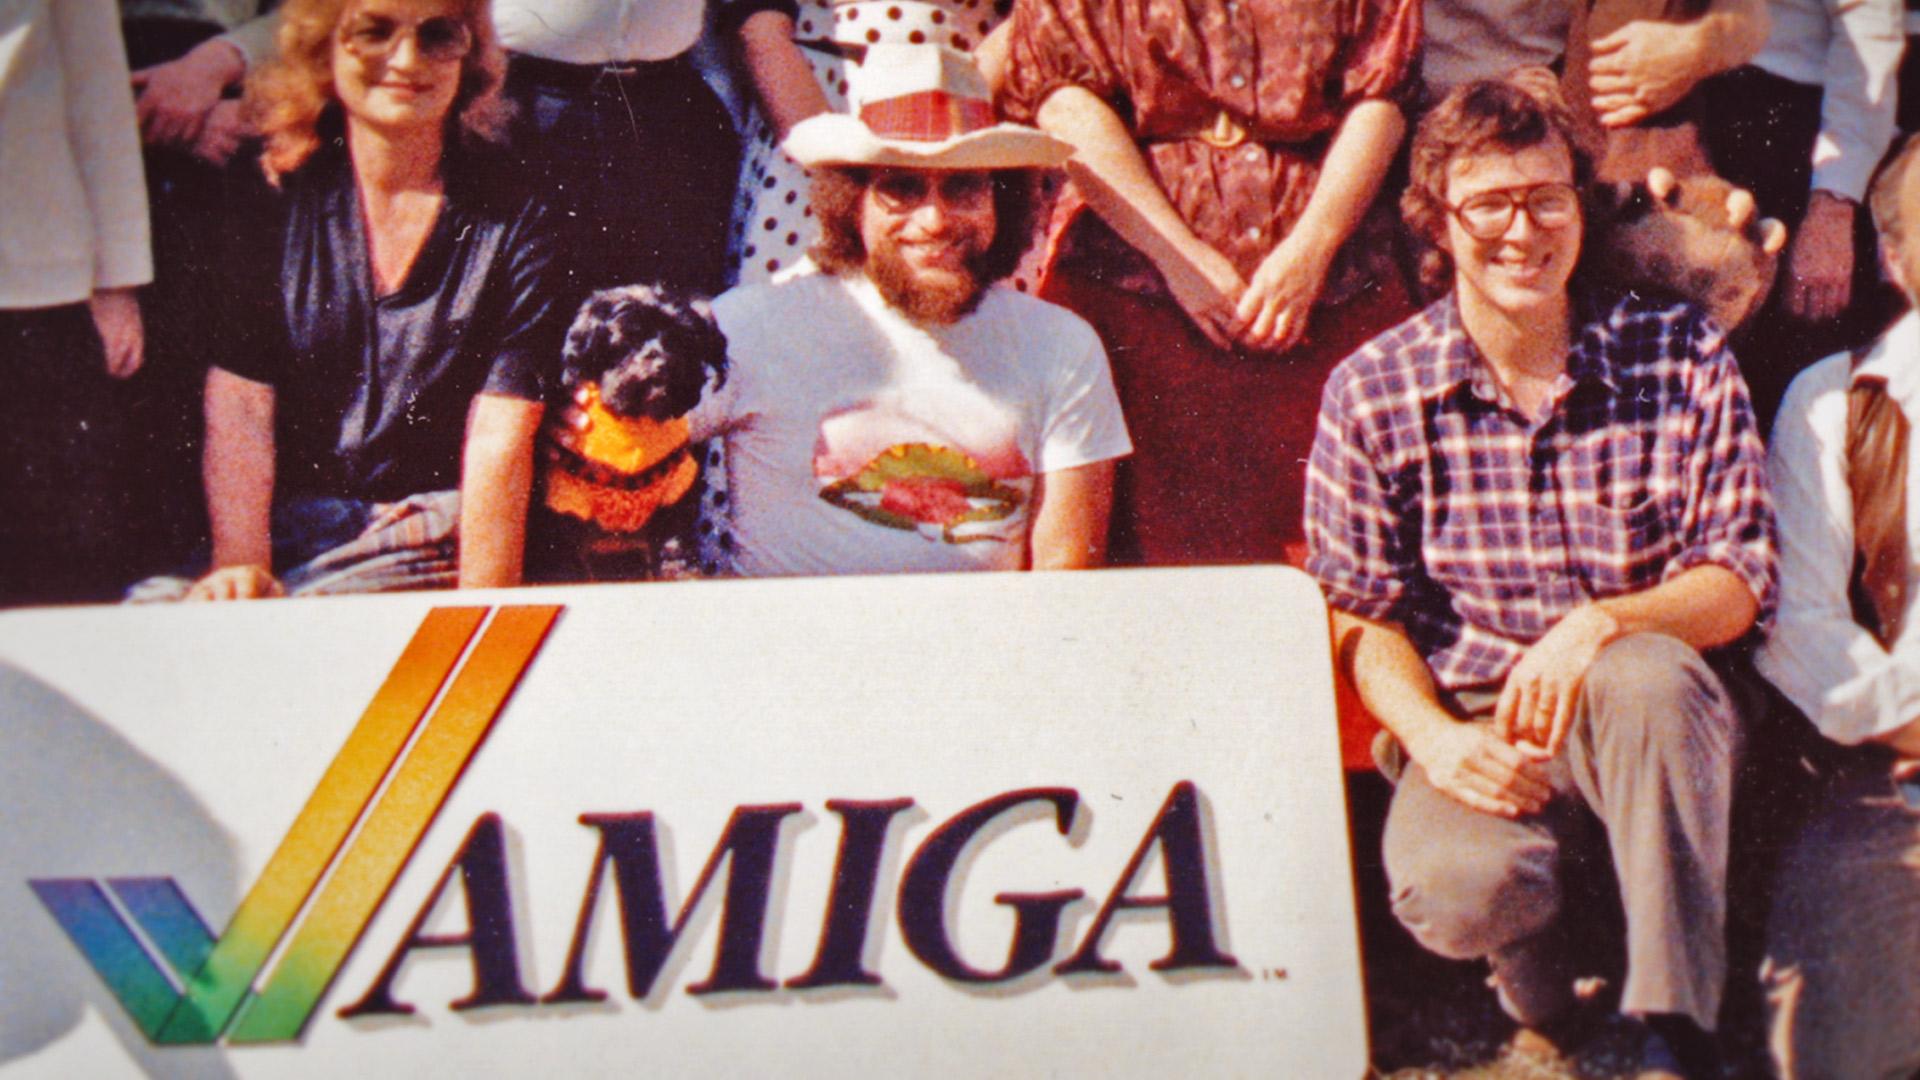 Director Zach Weddington Talks Viva Amiga and Beautiful Machines